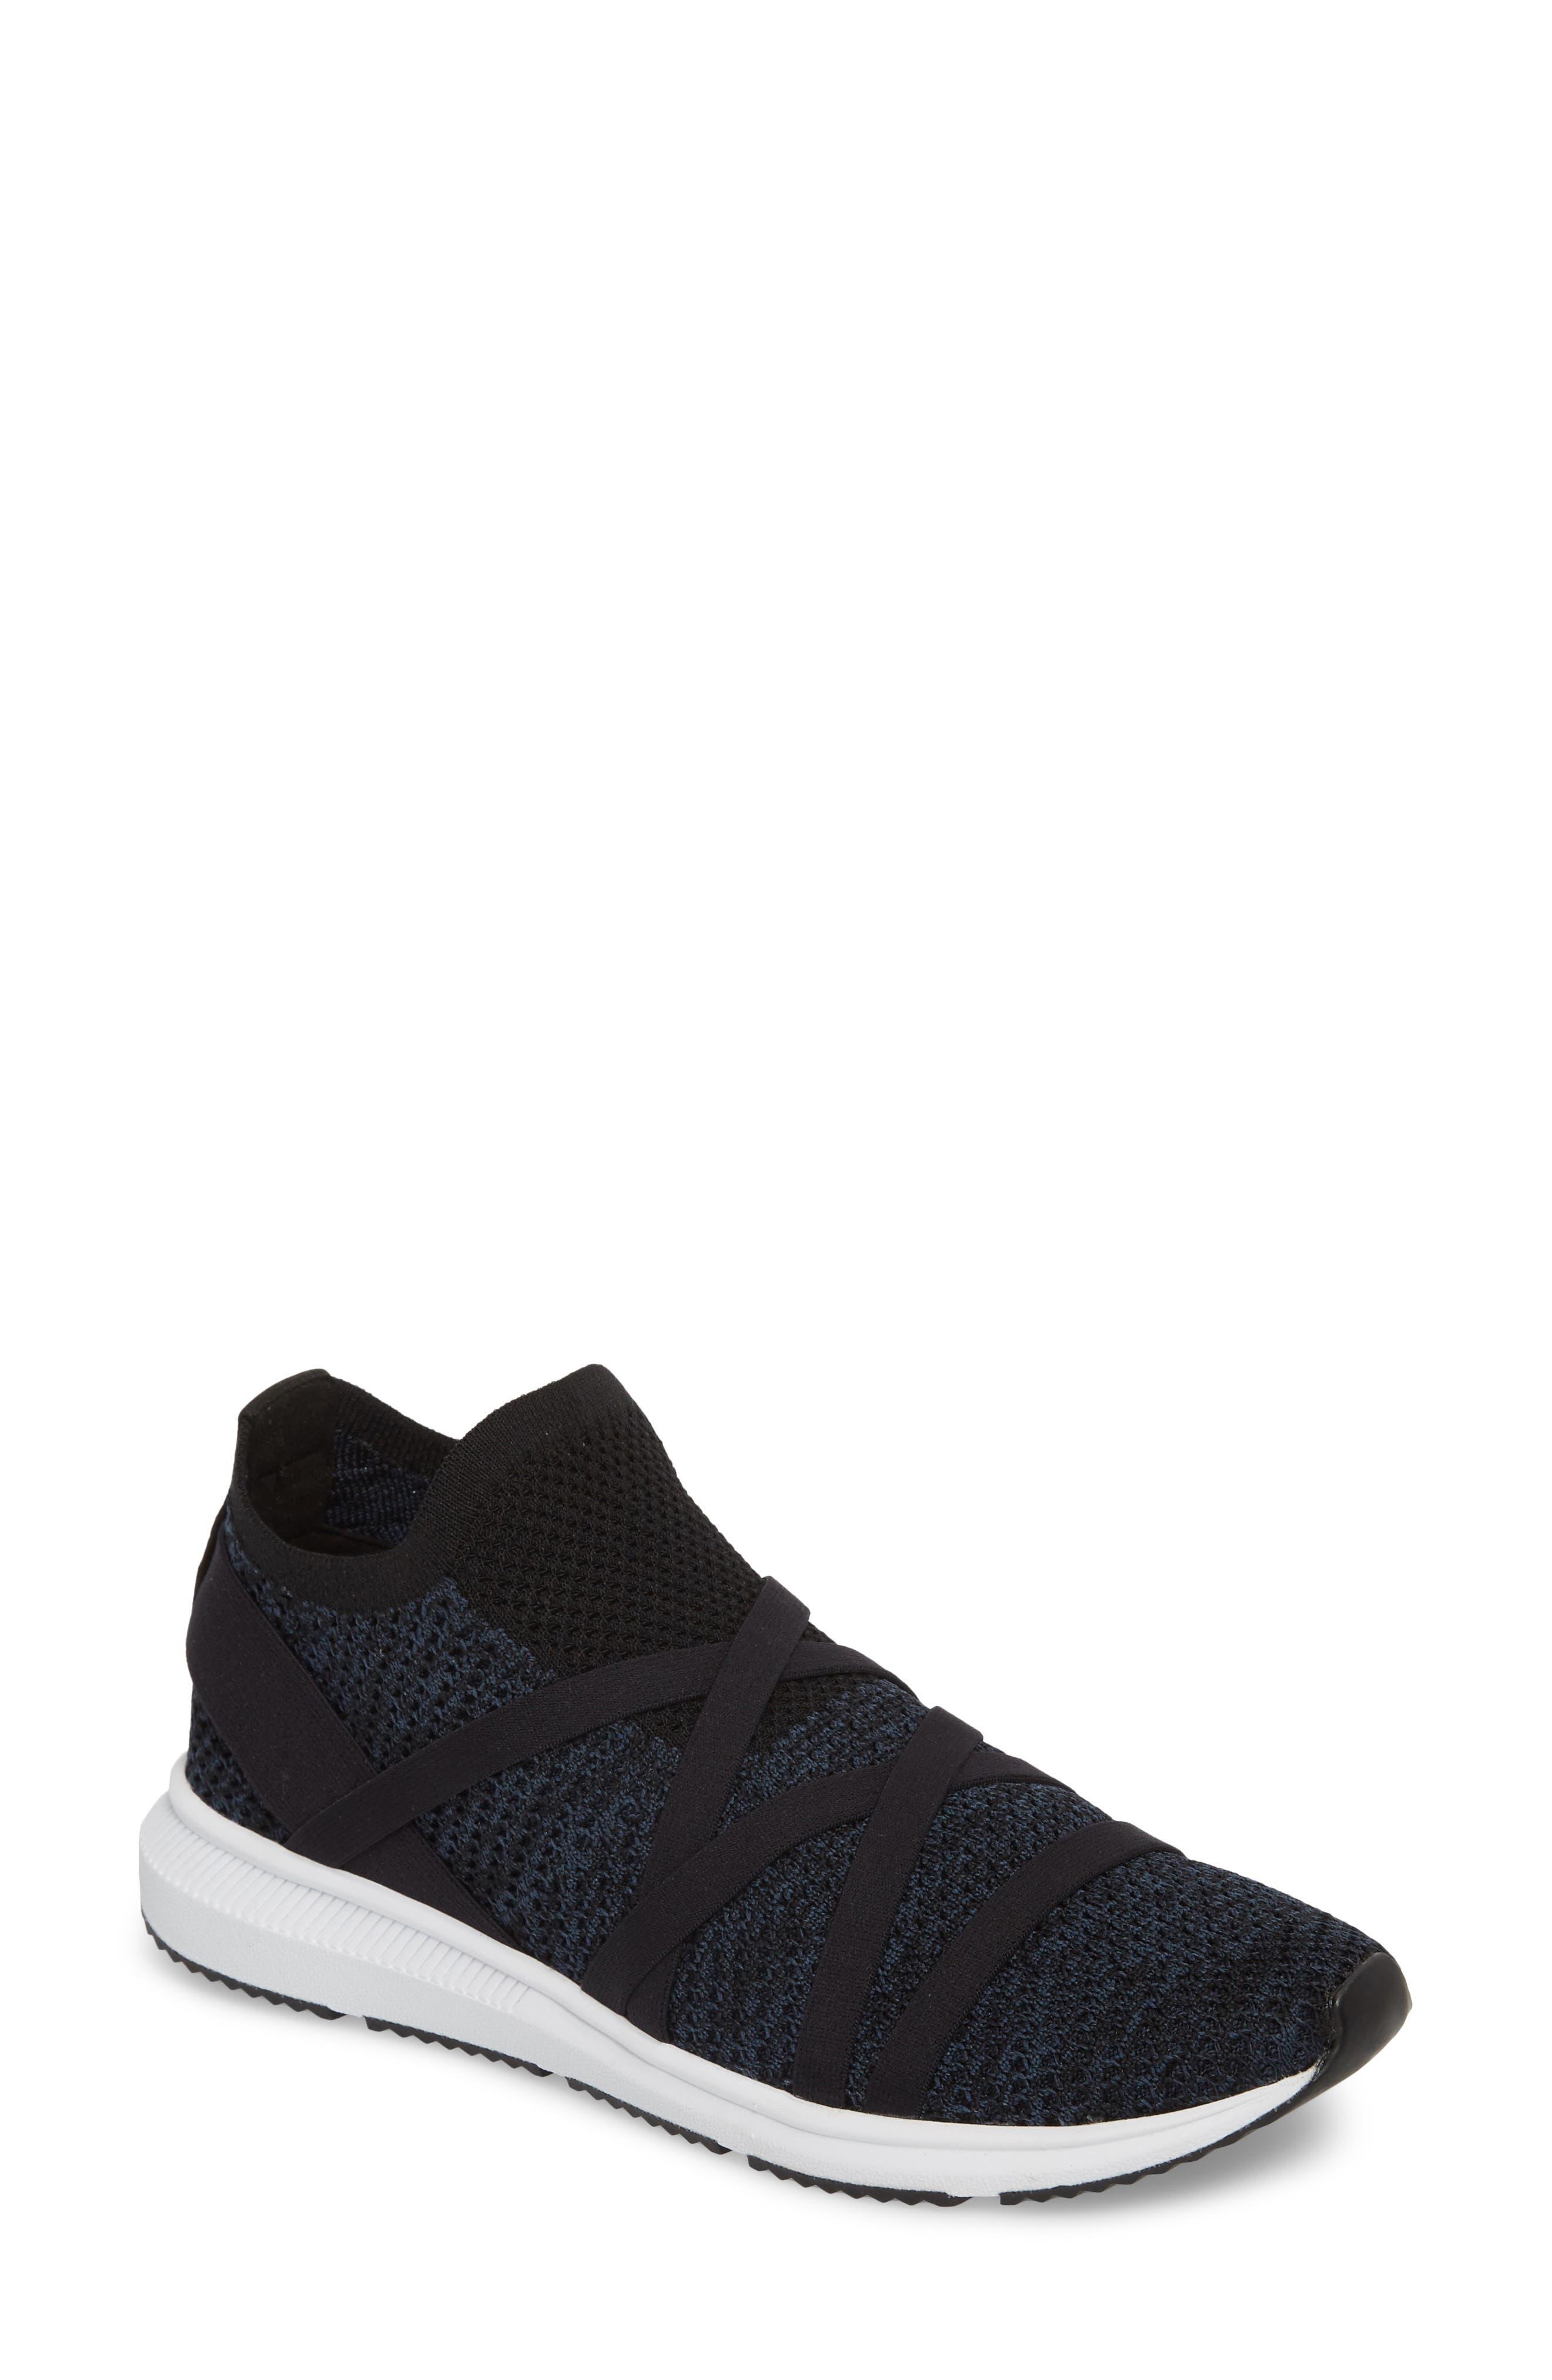 Xanady Woven Slip-On Sneaker,                             Main thumbnail 1, color,                             BLACK/ MARINE STRETCH